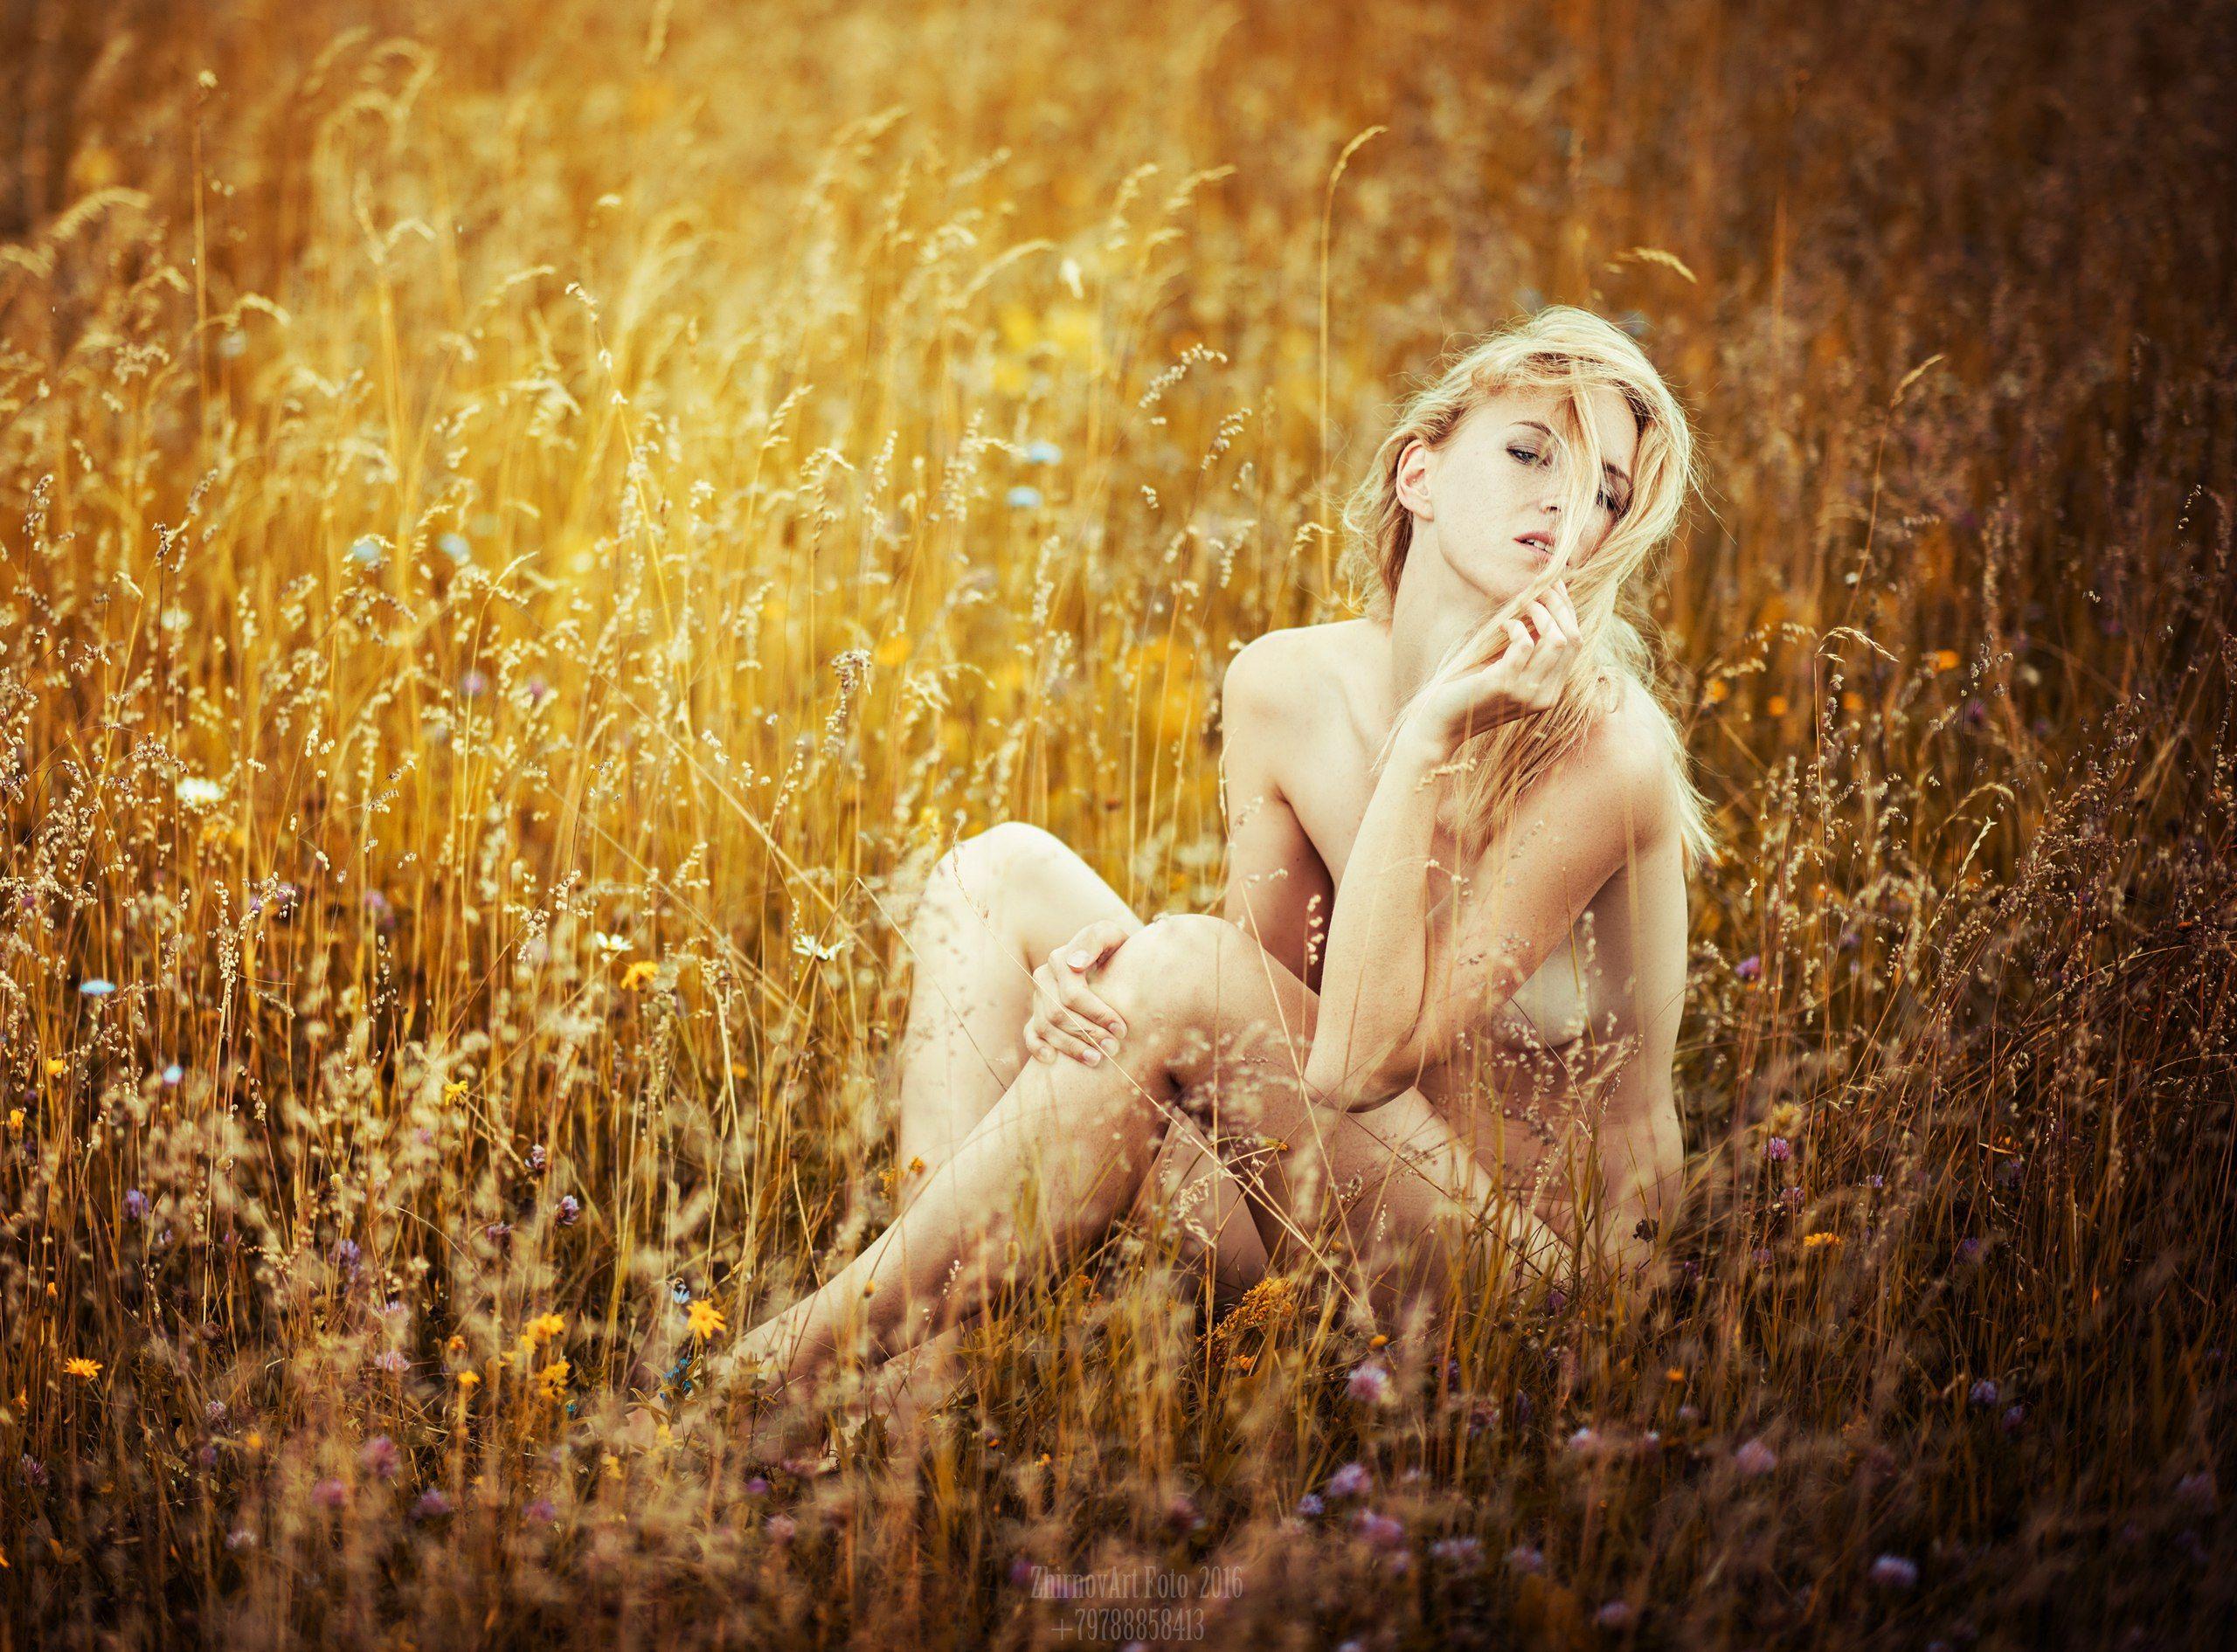 85mm, girl, people, portrait, девушка, портрет, портрет девушки, Илья  Жирнов